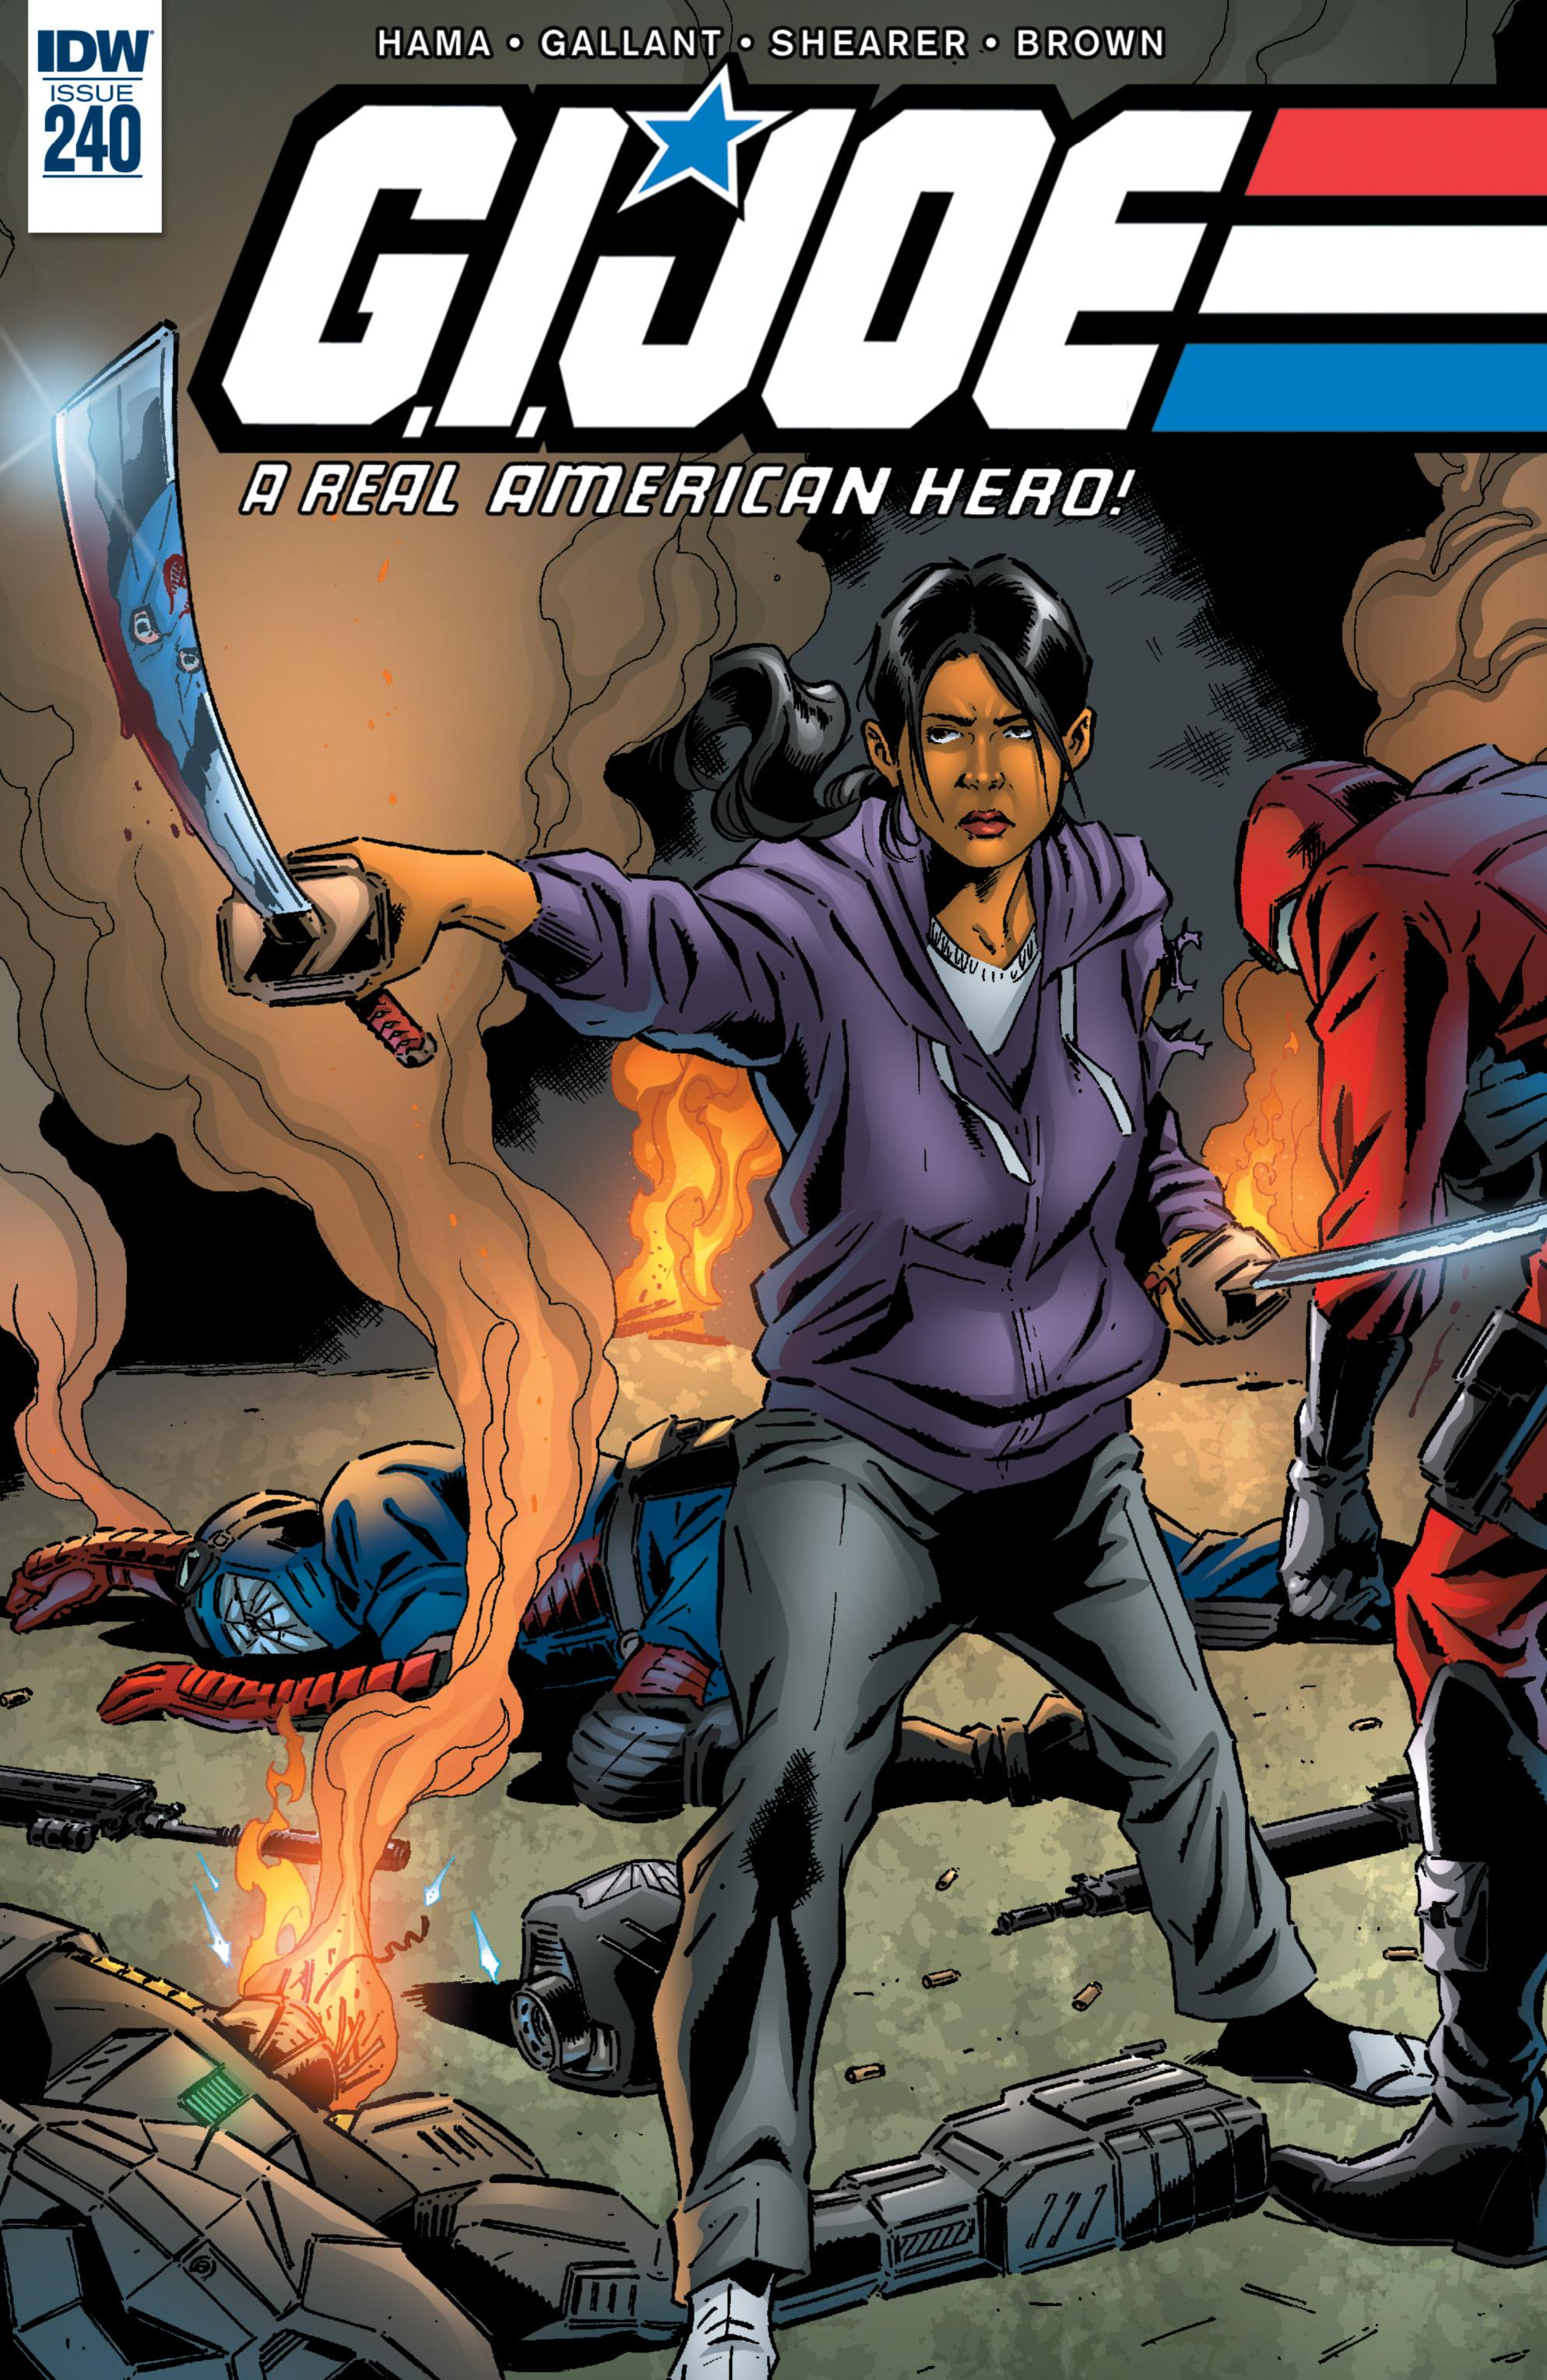 Read online G.I. Joe: A Real American Hero comic -  Issue #240 - 1